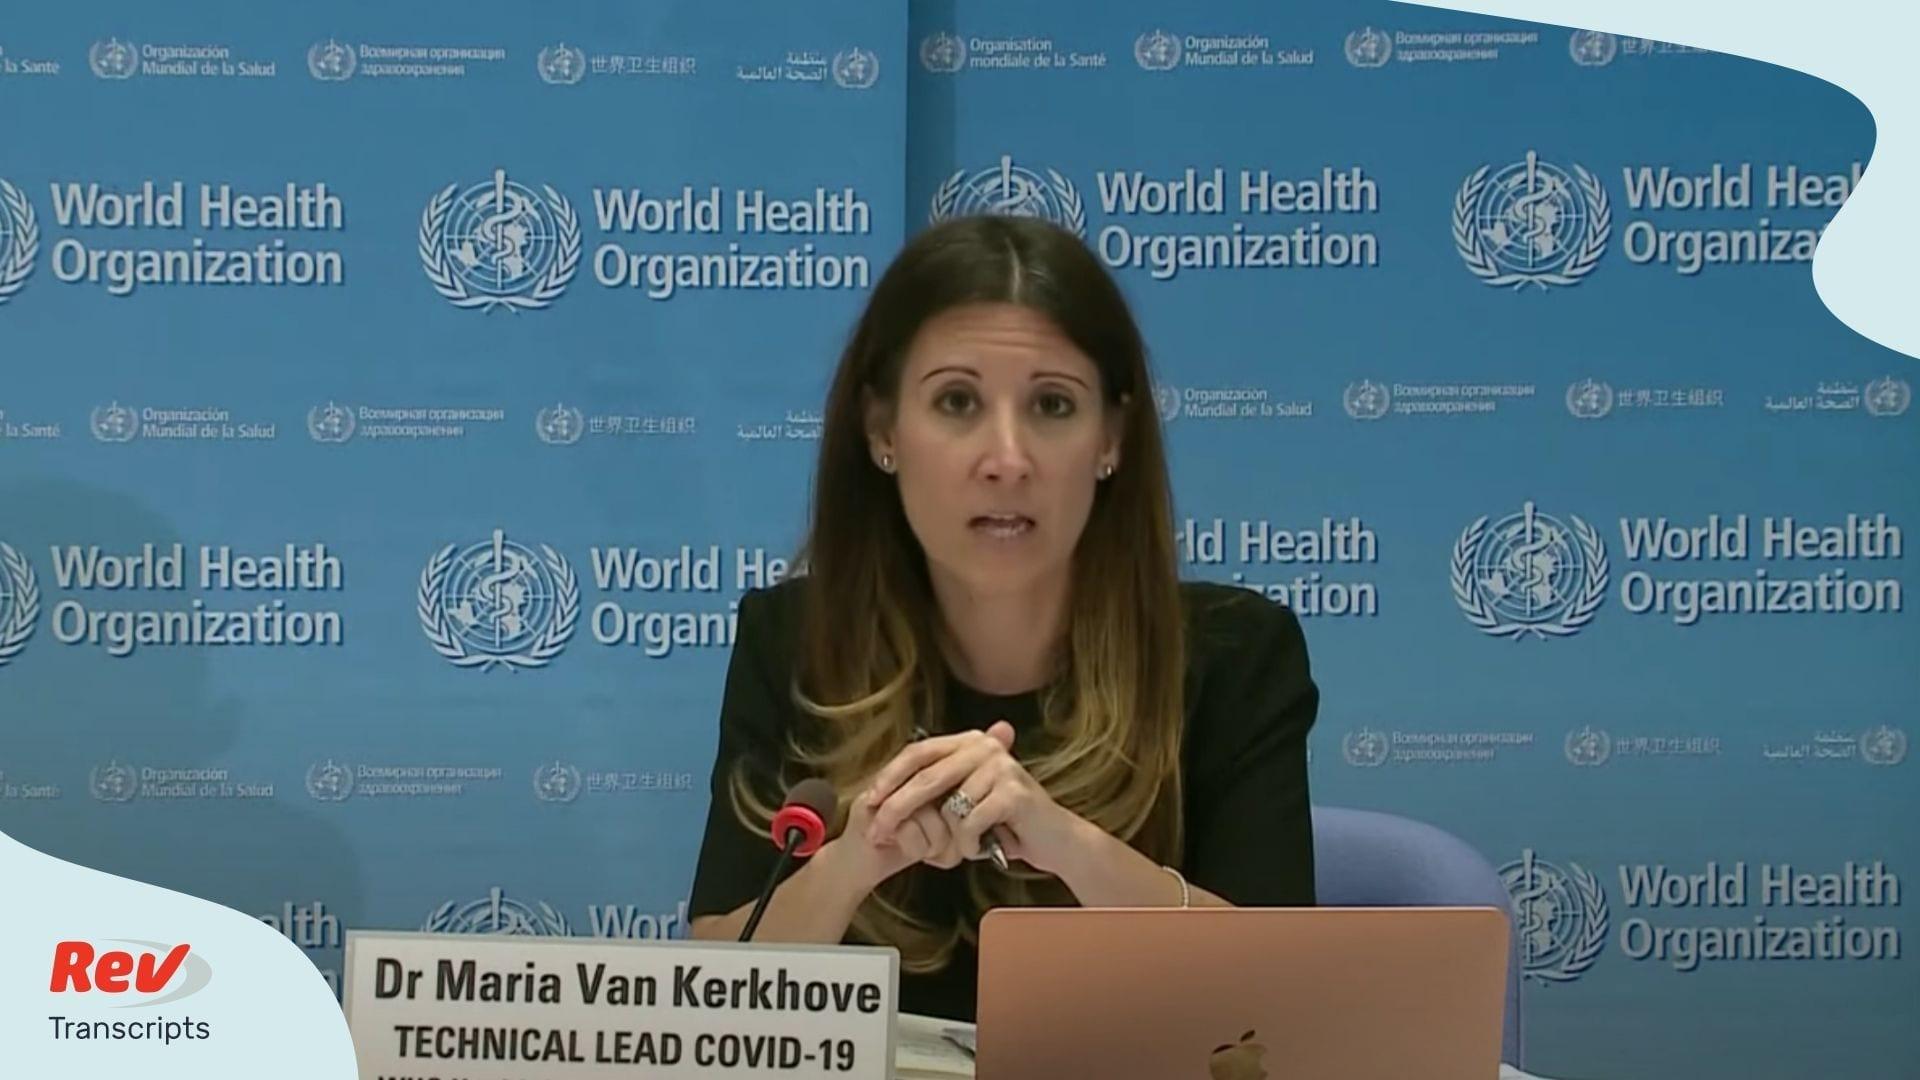 World Health Organization Coronavirus Press Conference May 11